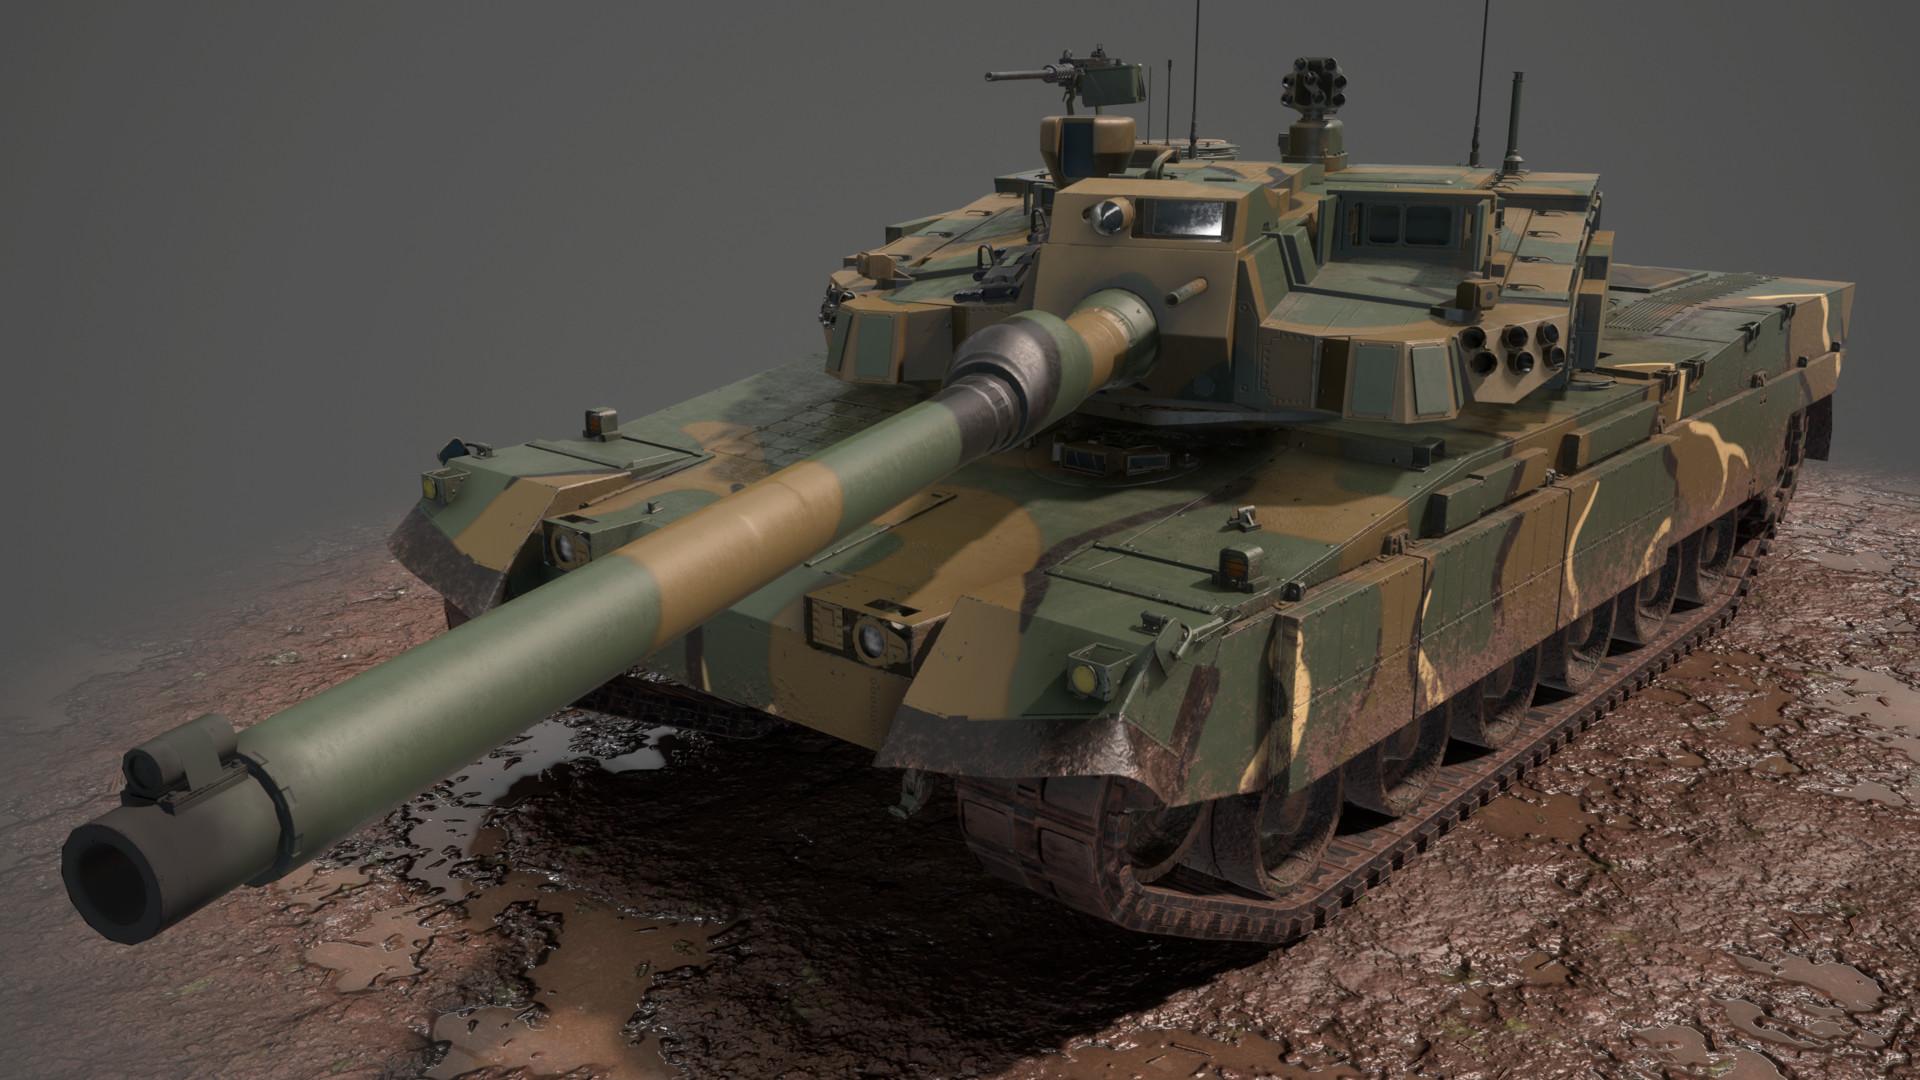 ArtStation - K2 Black Panther MBT, Brad Boyles